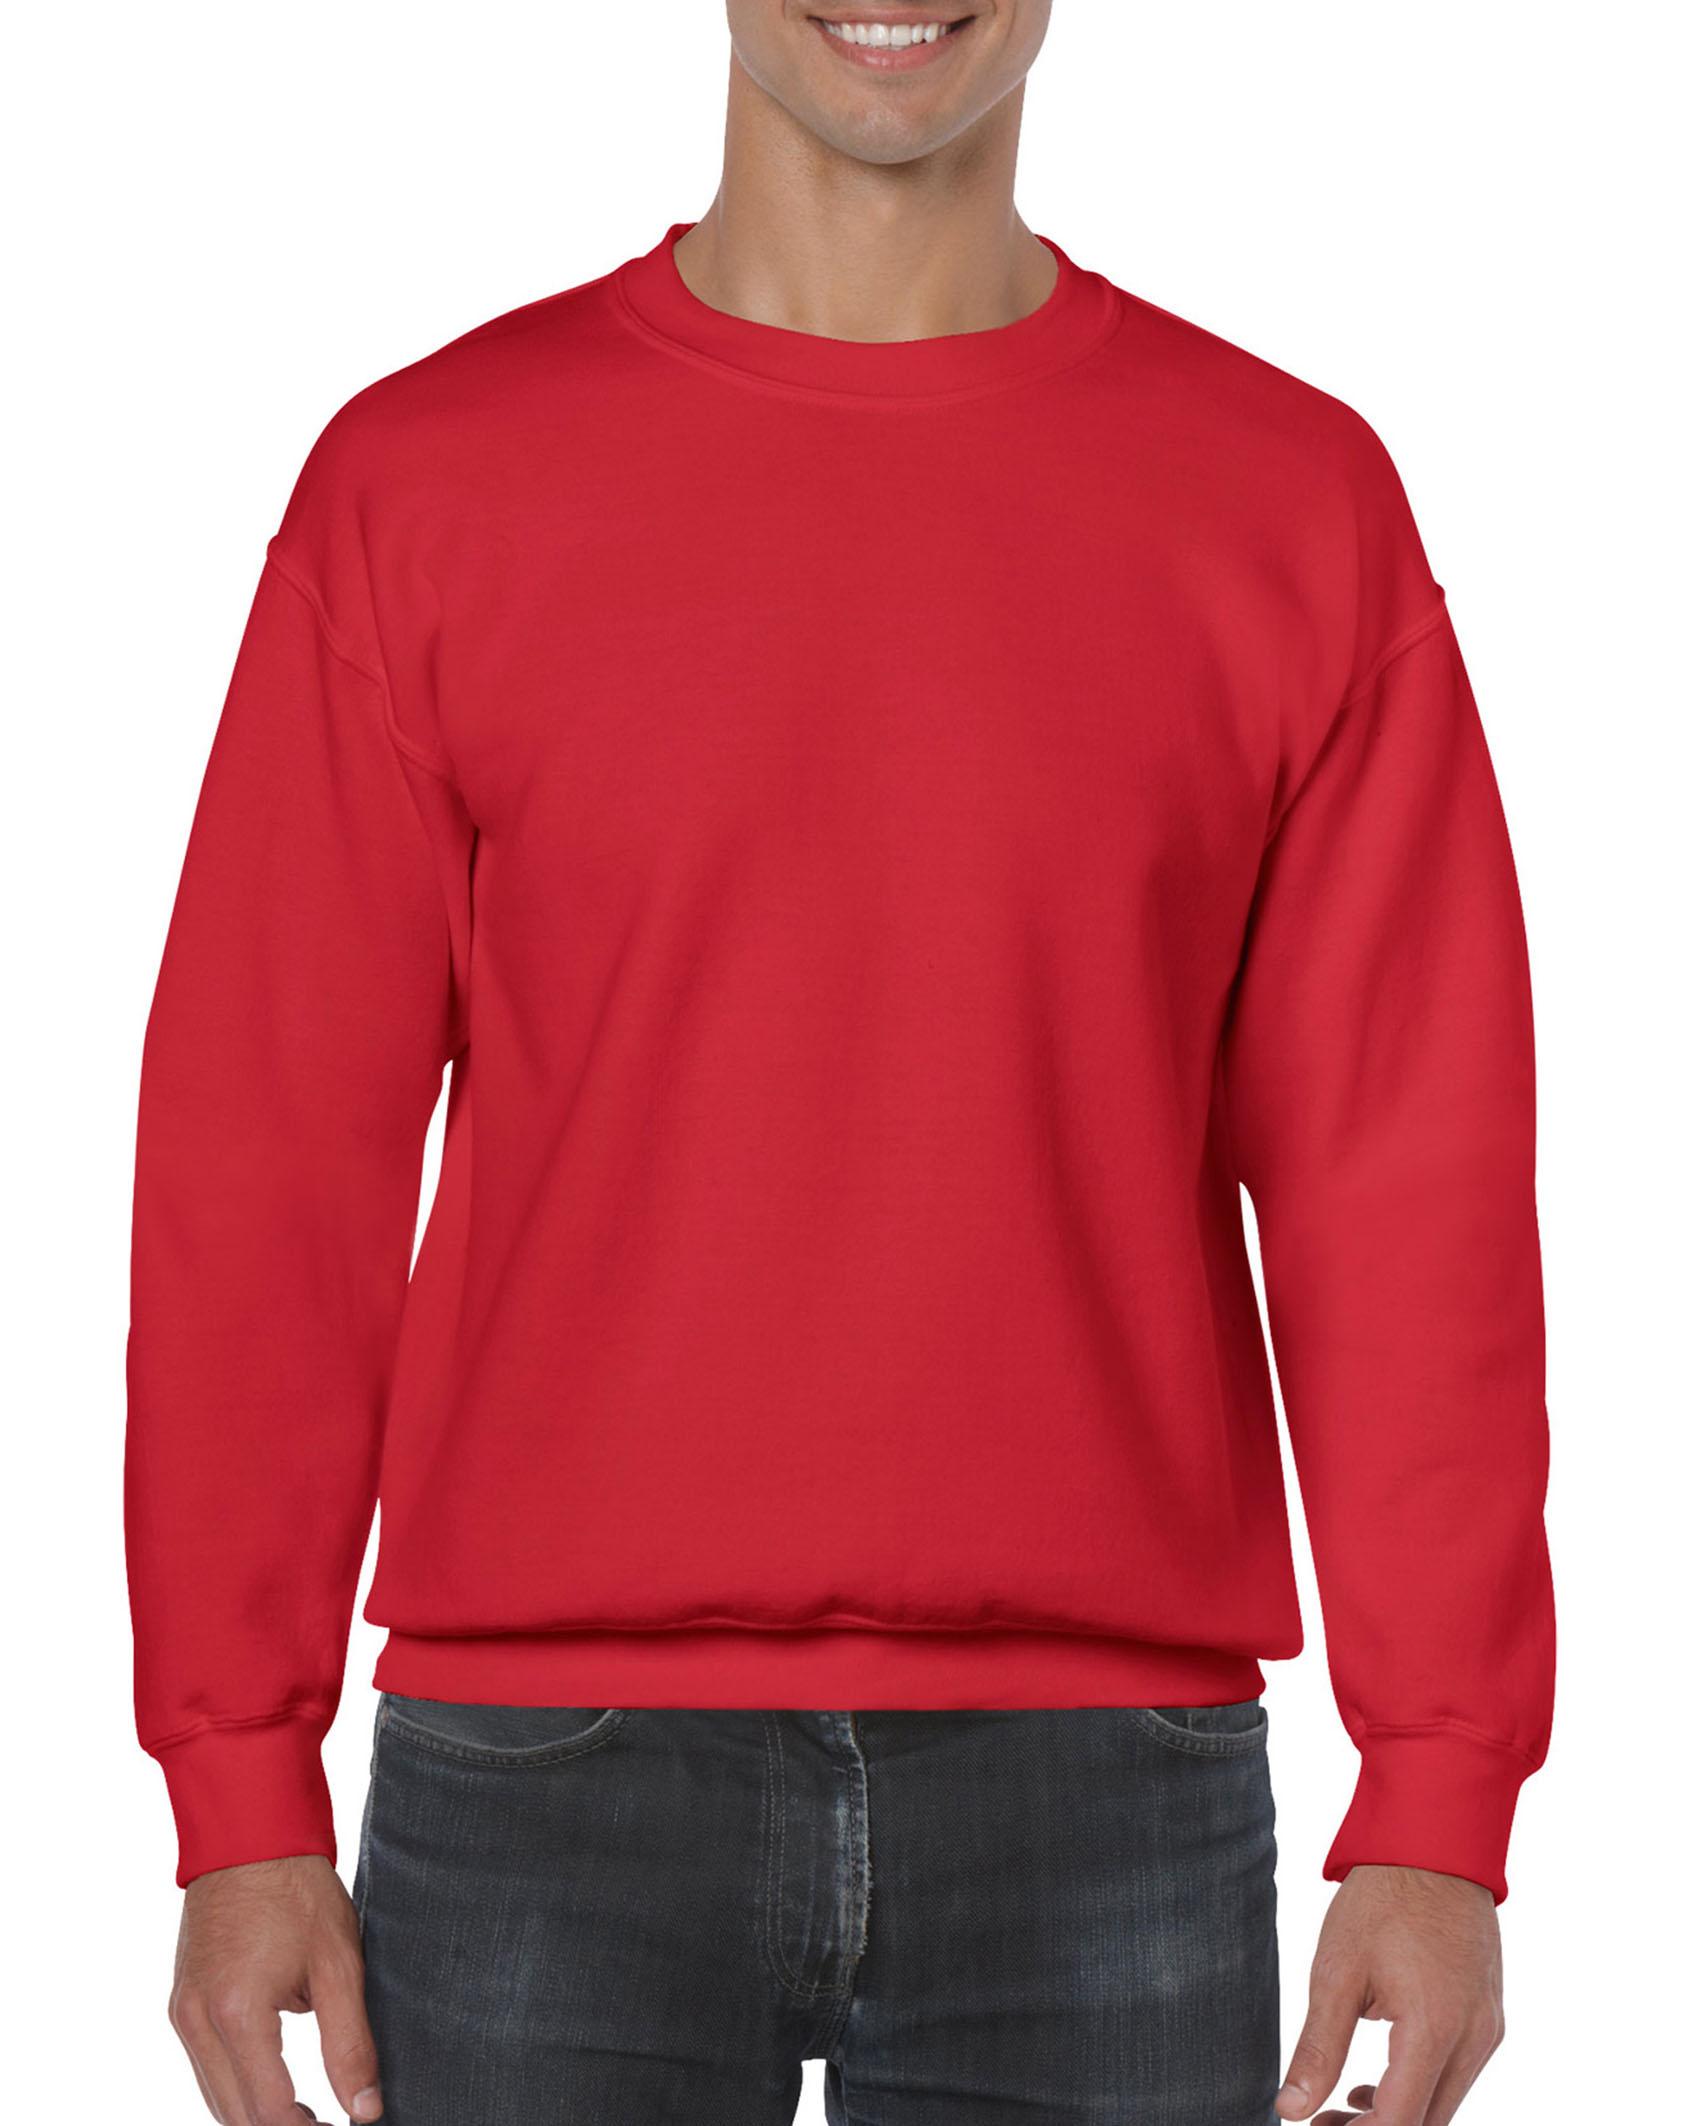 25St Gildan Sweater incl. 1k opdruk (Red)